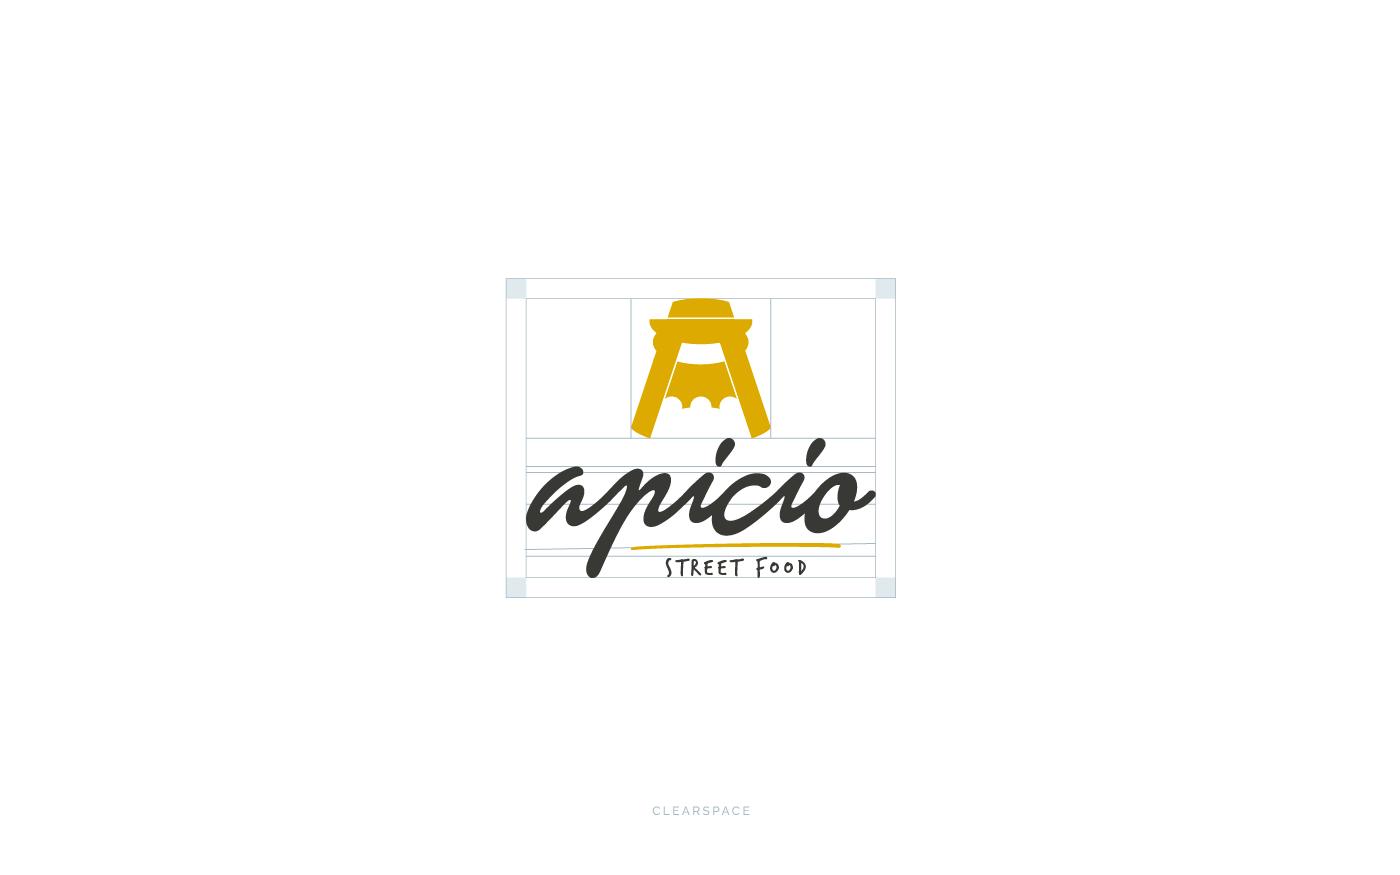 Apicio Street Food Logo Clearspace